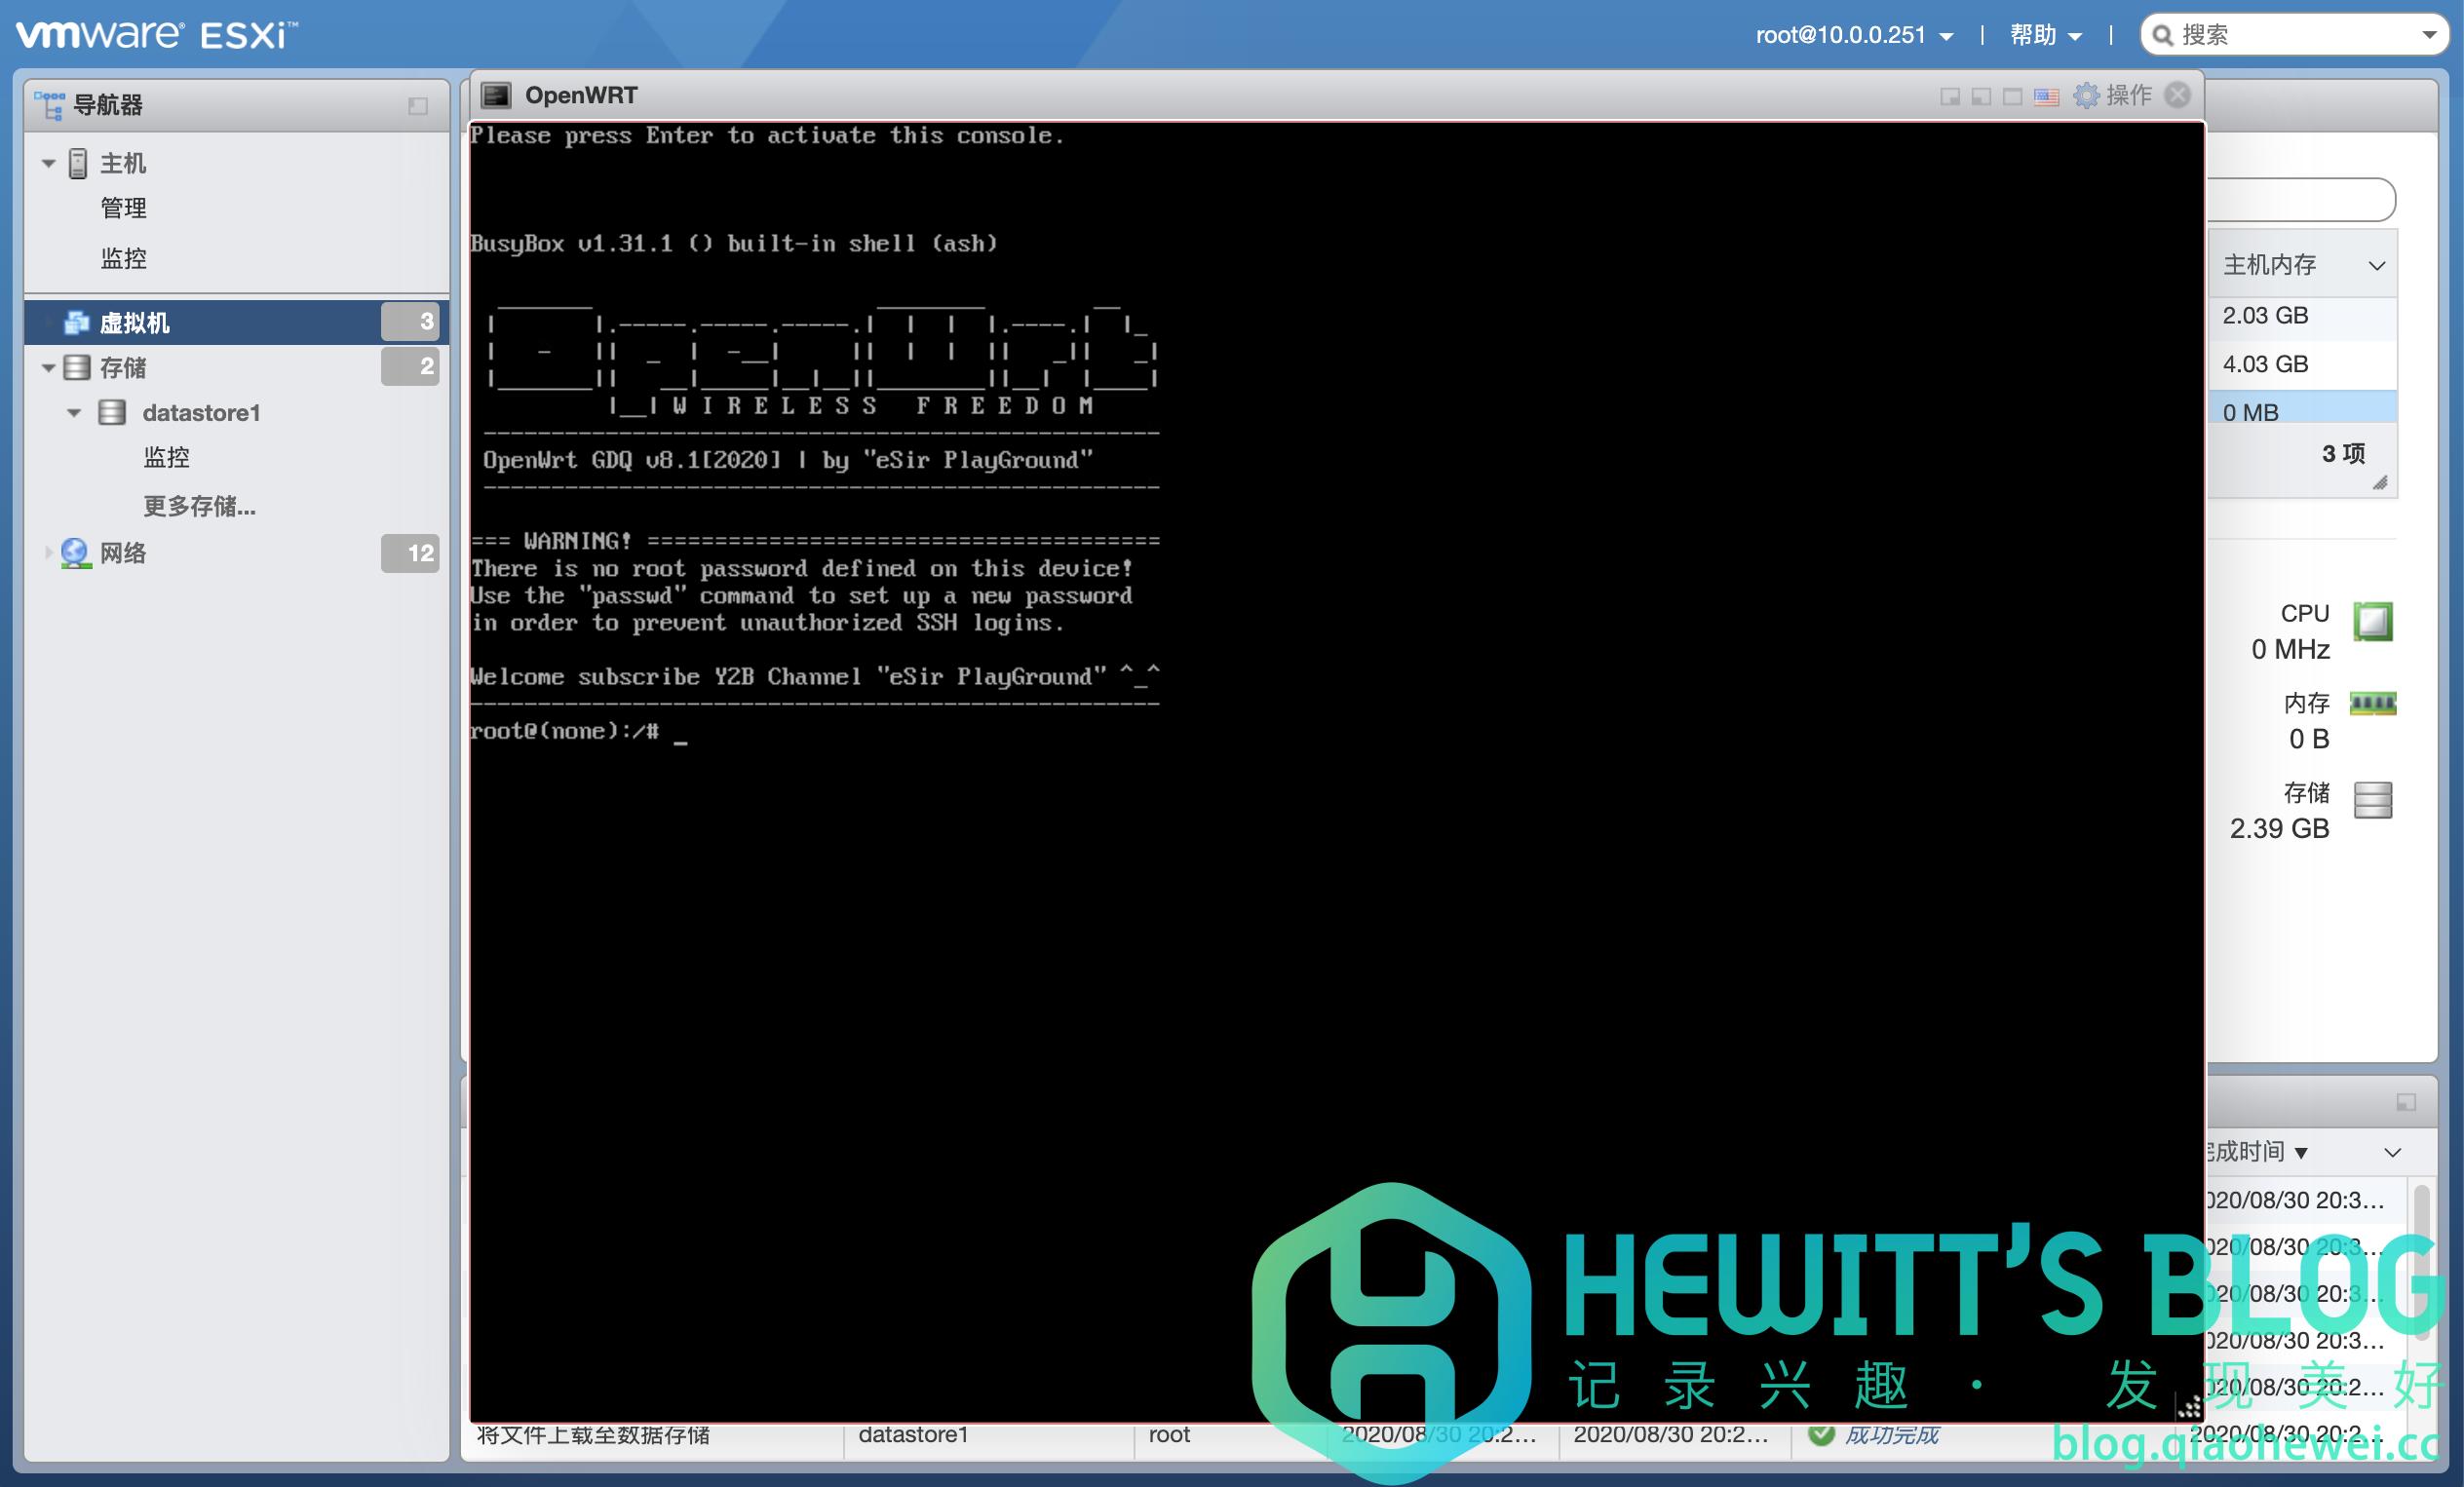 ESXI安装OpenWRT & LEDE软路由部署指南(附镜像下载)插图23